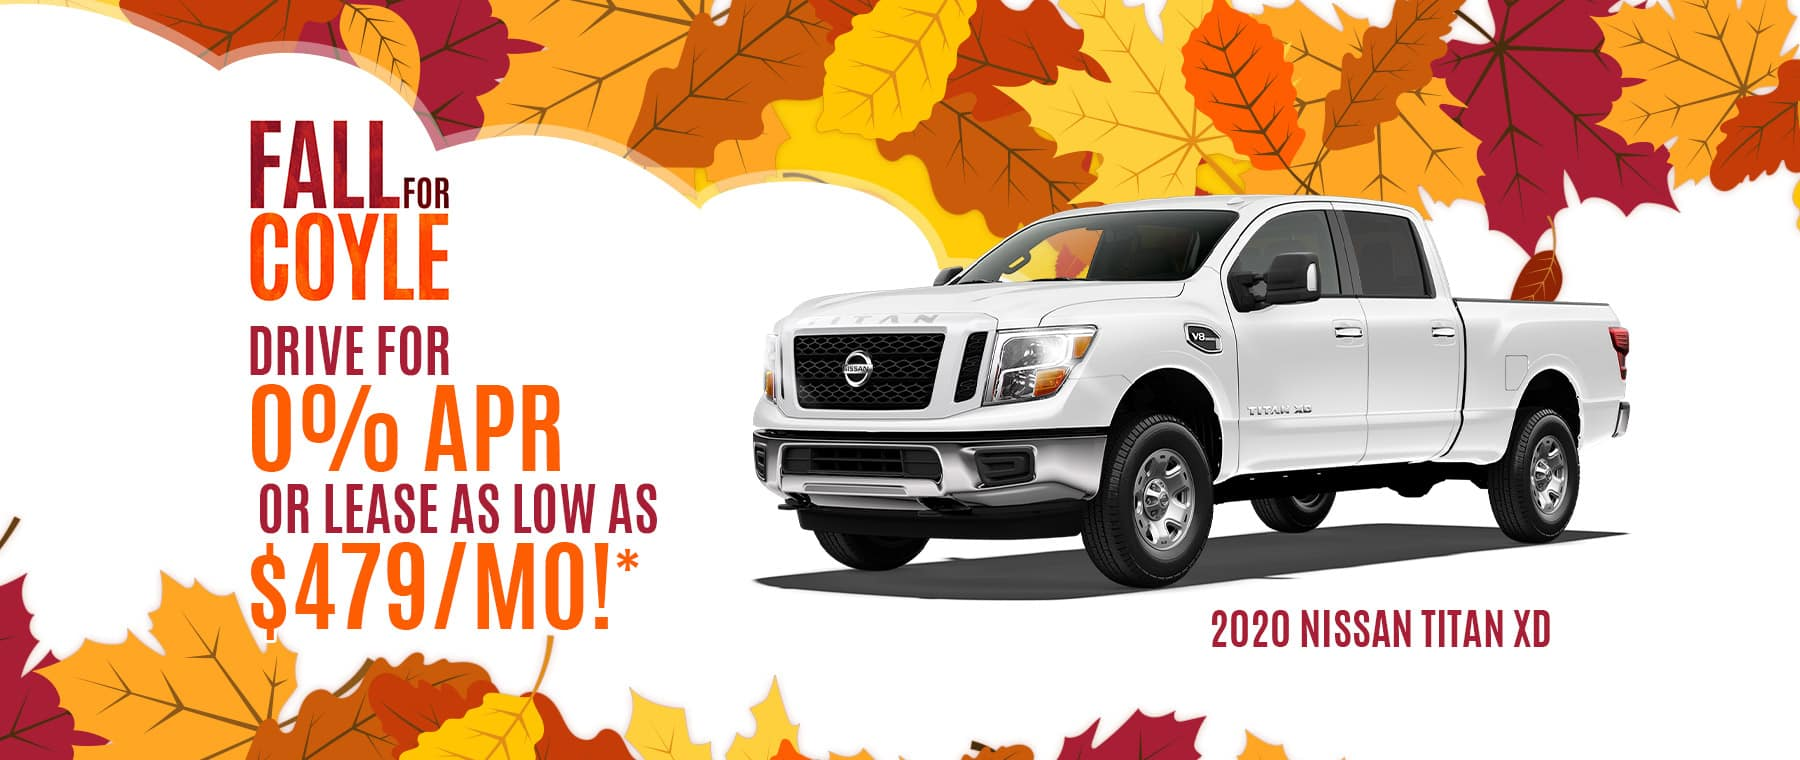 Best Offer on a new Nissan Titan XD near Louisville, Kentucky